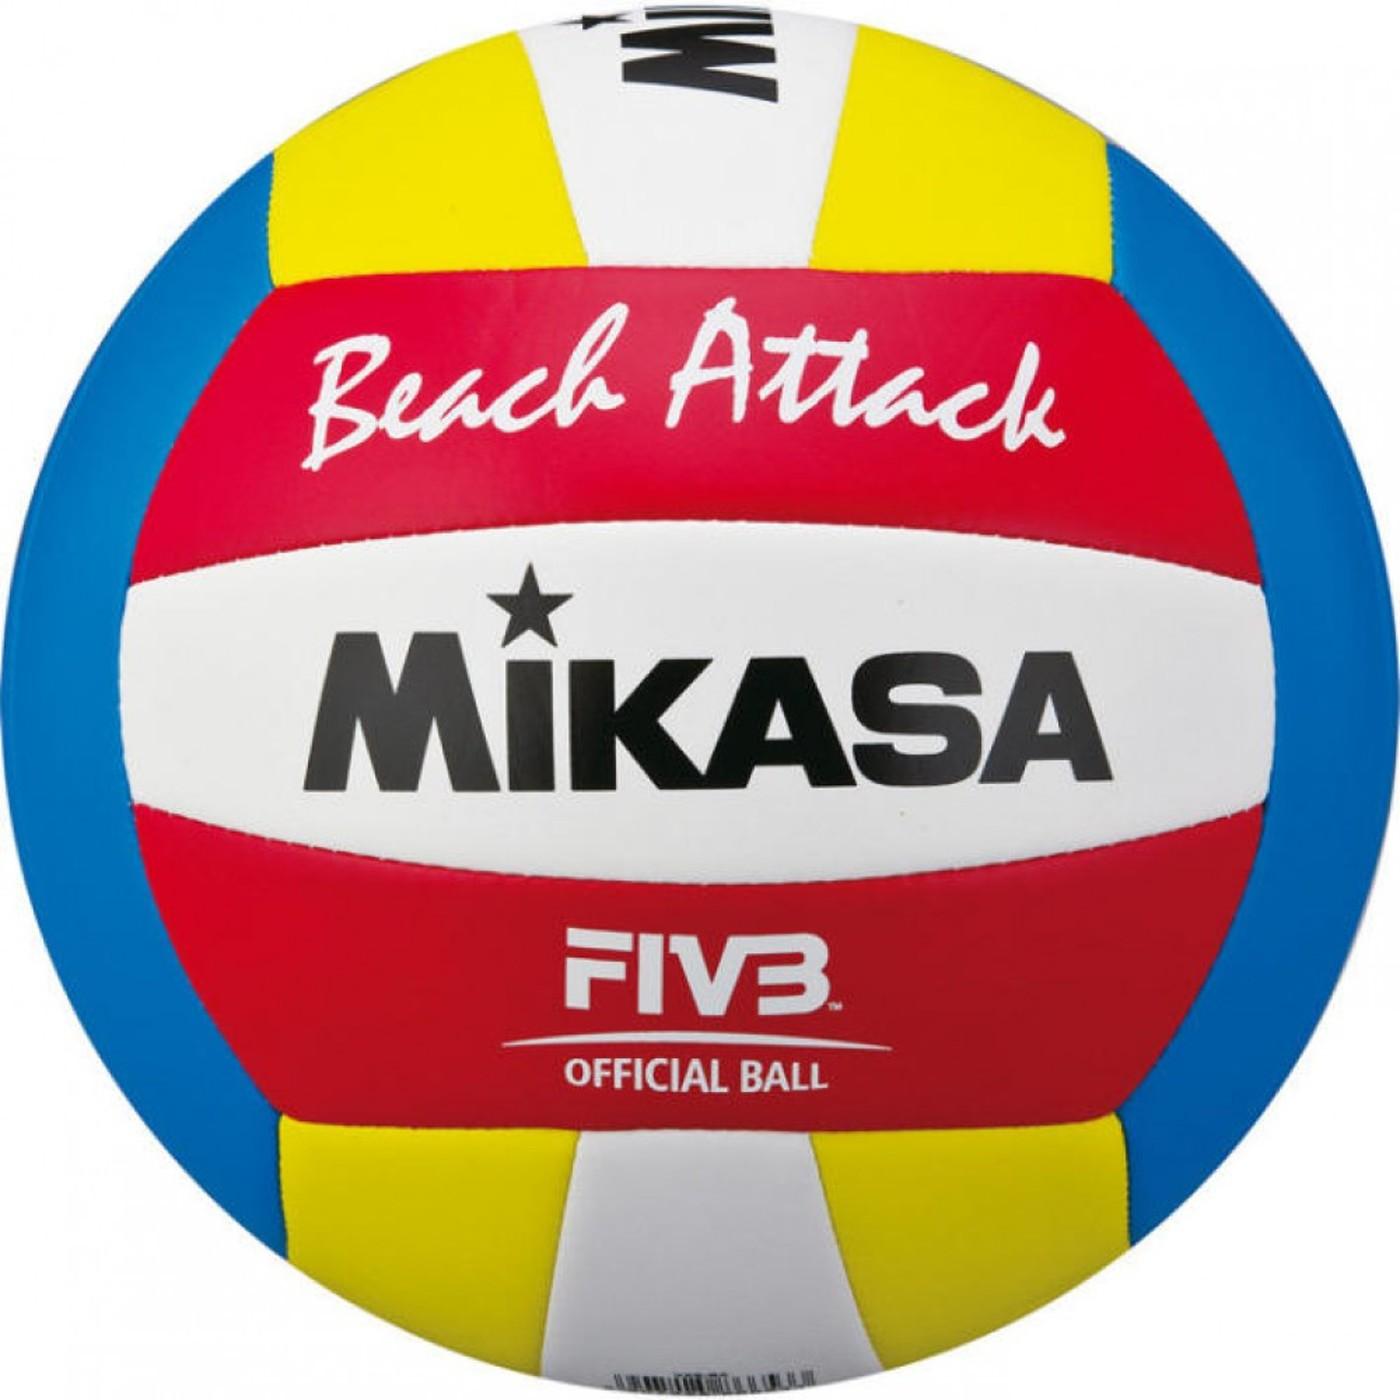 MIKASA VXS BEACH ATTACK